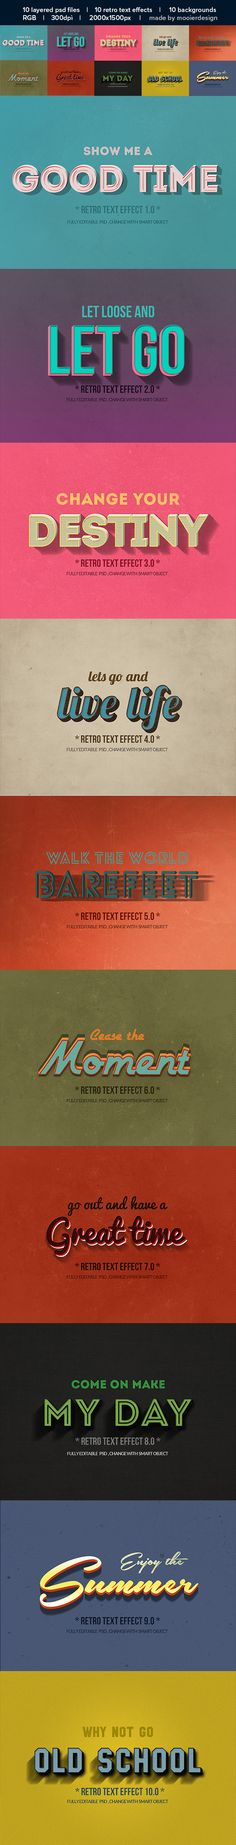 Vintage Retro Text Effects Vintage Designs, Retro Vintage, 3d Typography, Travel Brochure, Text Effects, Live Life, Design Elements, Old School, Presentation